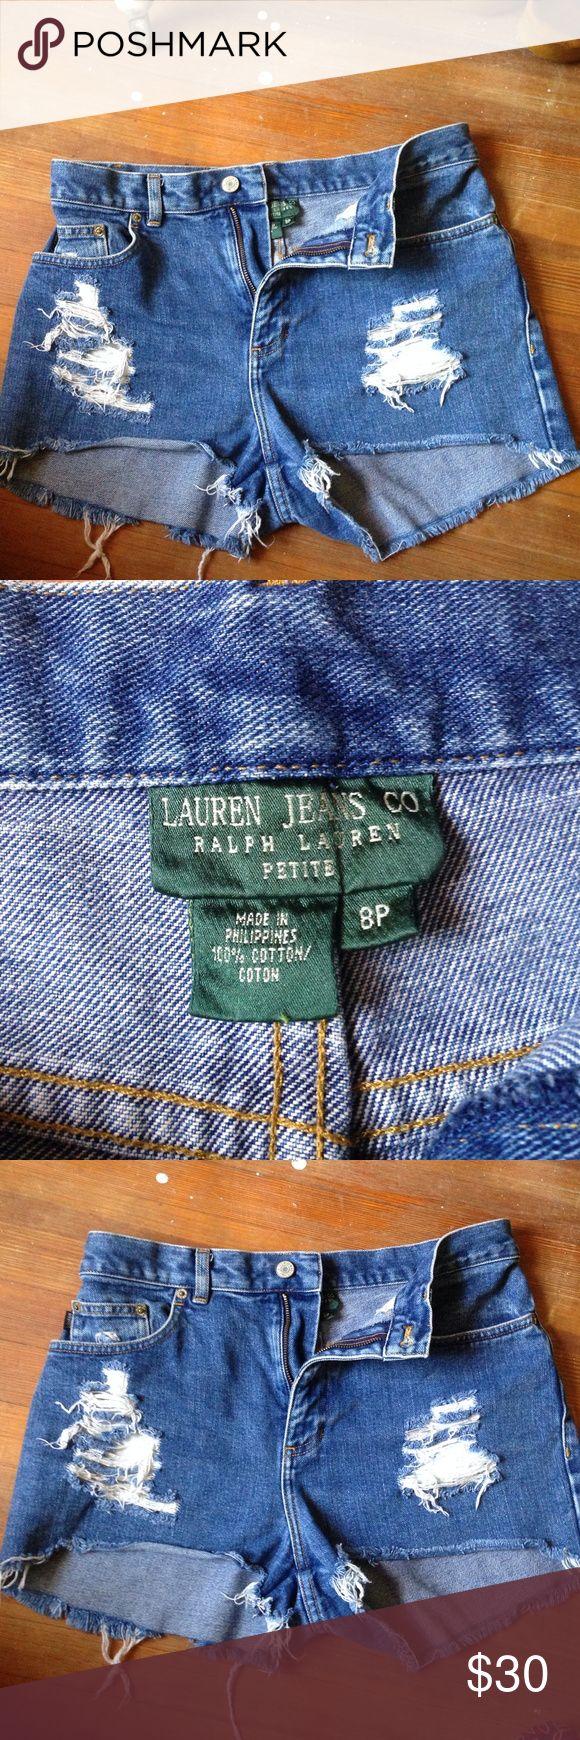 Ralph Lauren Jean shorts petite size 8P worn maybee a few times at most Ralph Lauren Shorts Jean Shorts